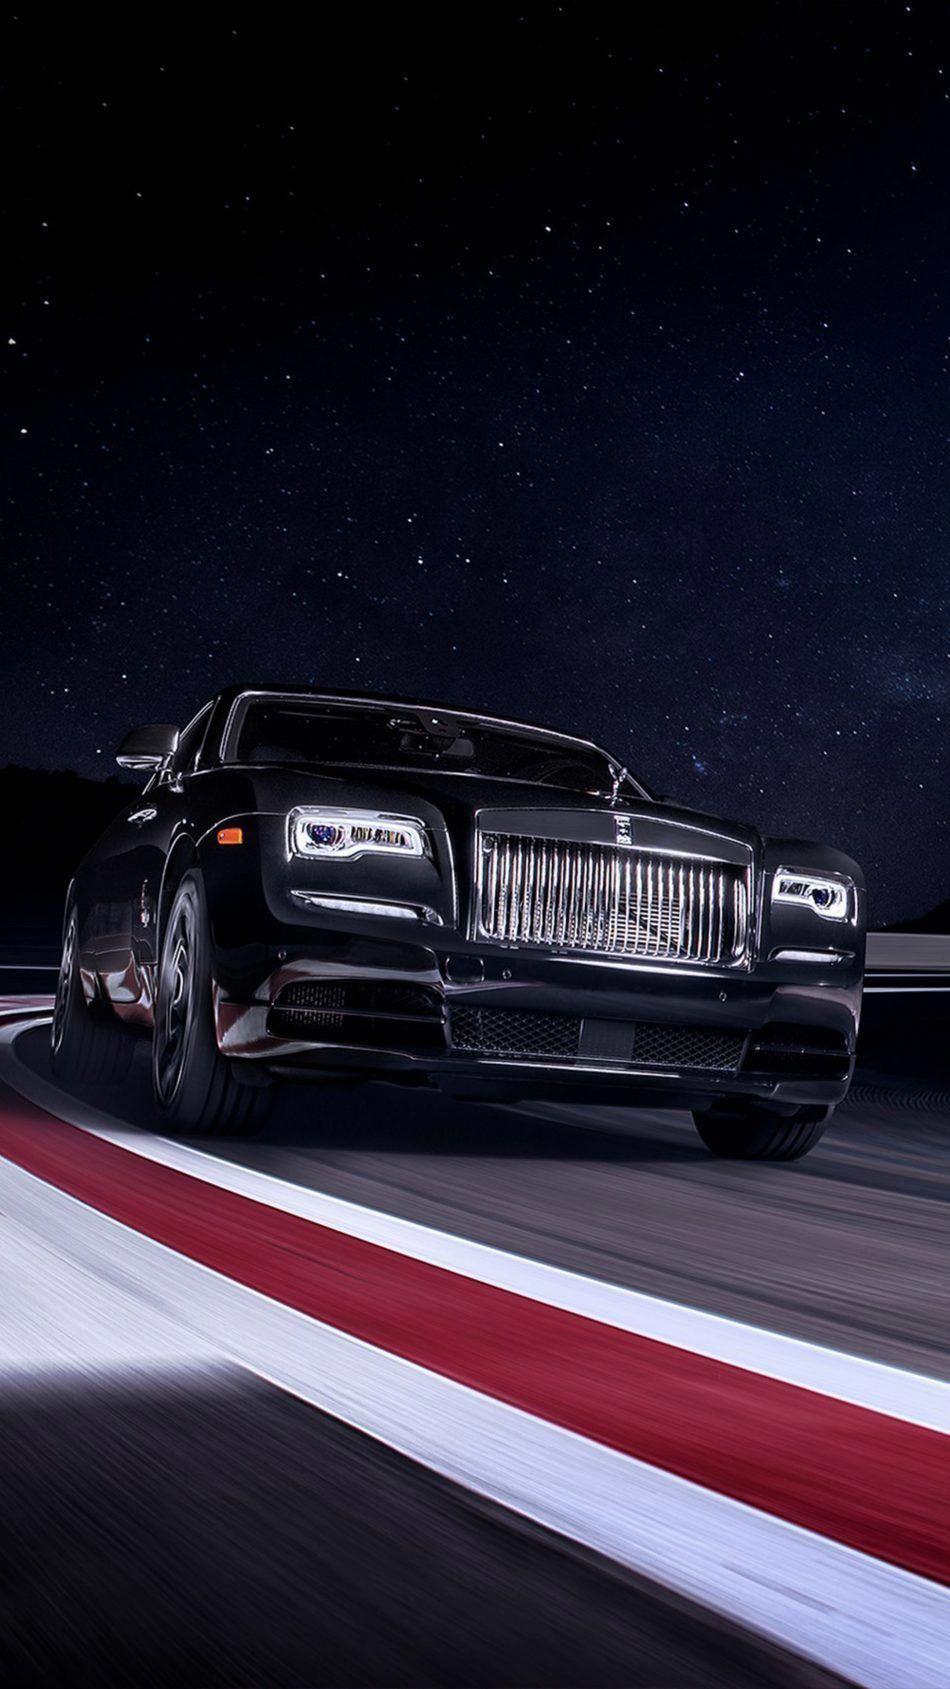 Rolls Royce Black Badge Wraith On Race Track 4k Ultra Hd Mobile Wallpaper Rollsroyceclassiccars Rolls Royce Black Luxury Cars Rolls Royce Rolls Royce